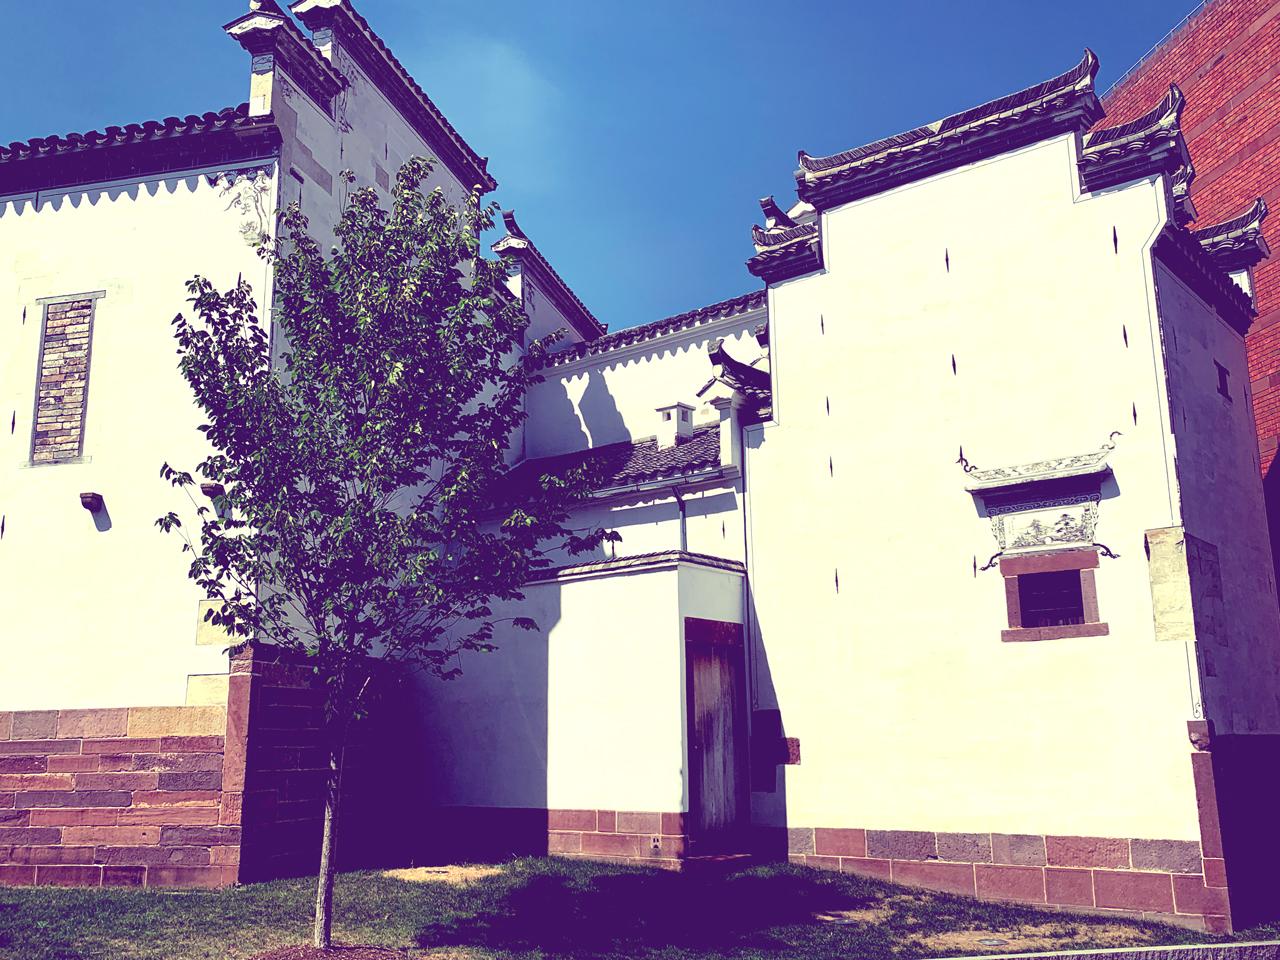 yin-yu-tang-house-peabody-essex-museum-salem-massachusetts-1280x960-02